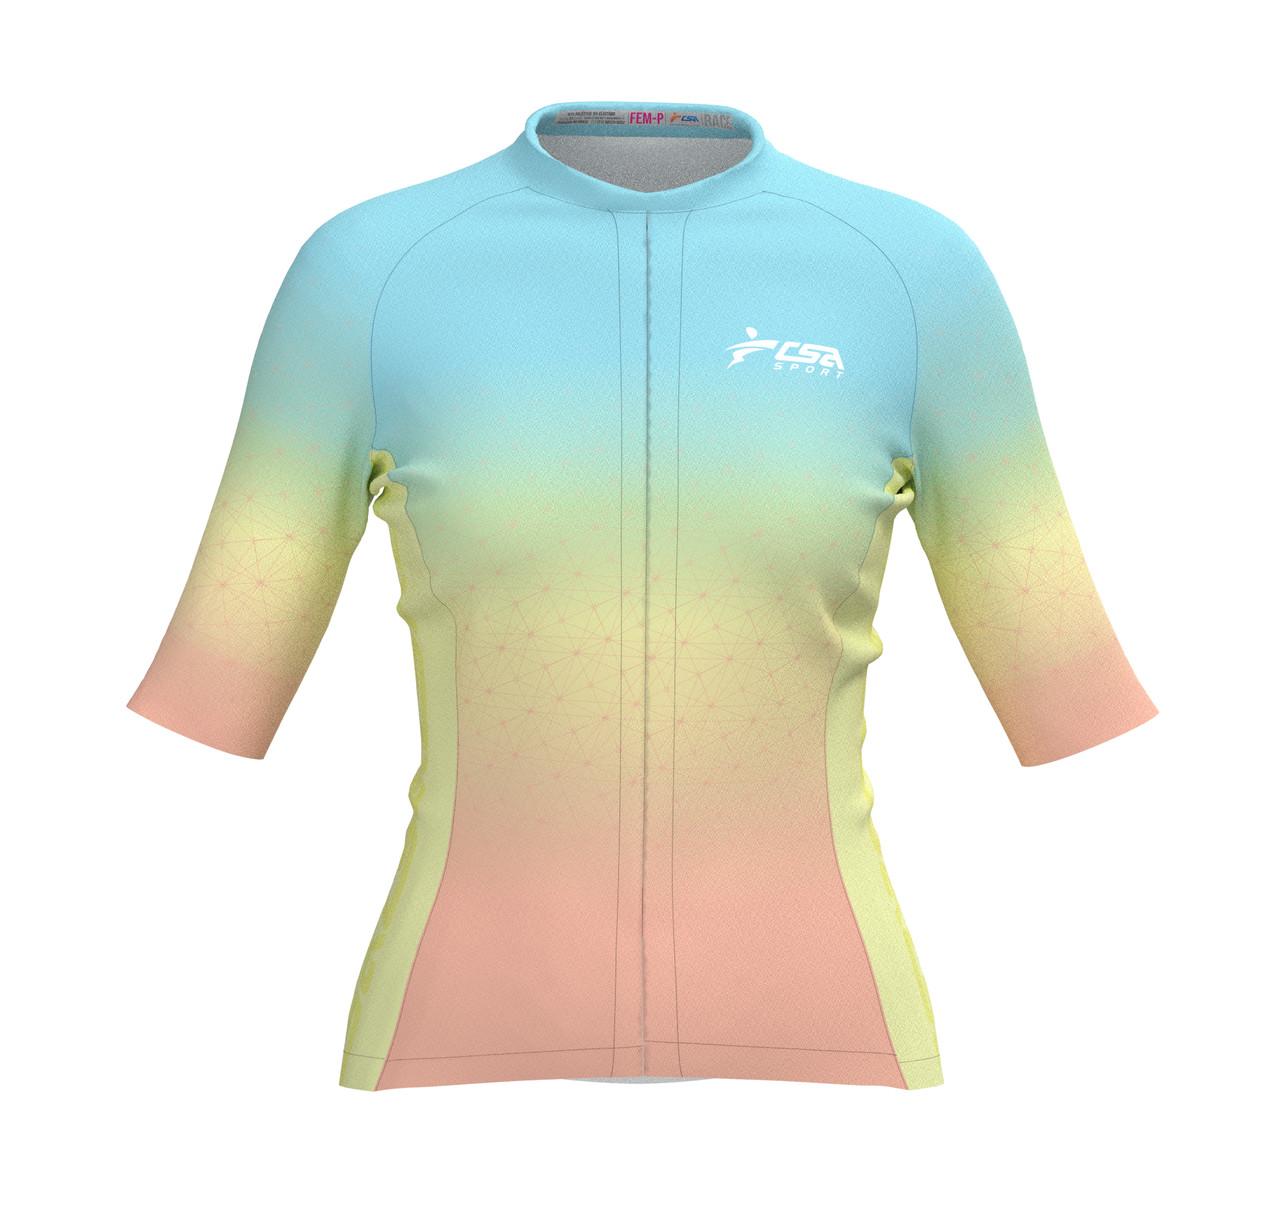 Camisa Ciclista Fast CSA Sport Feminina Sunrise